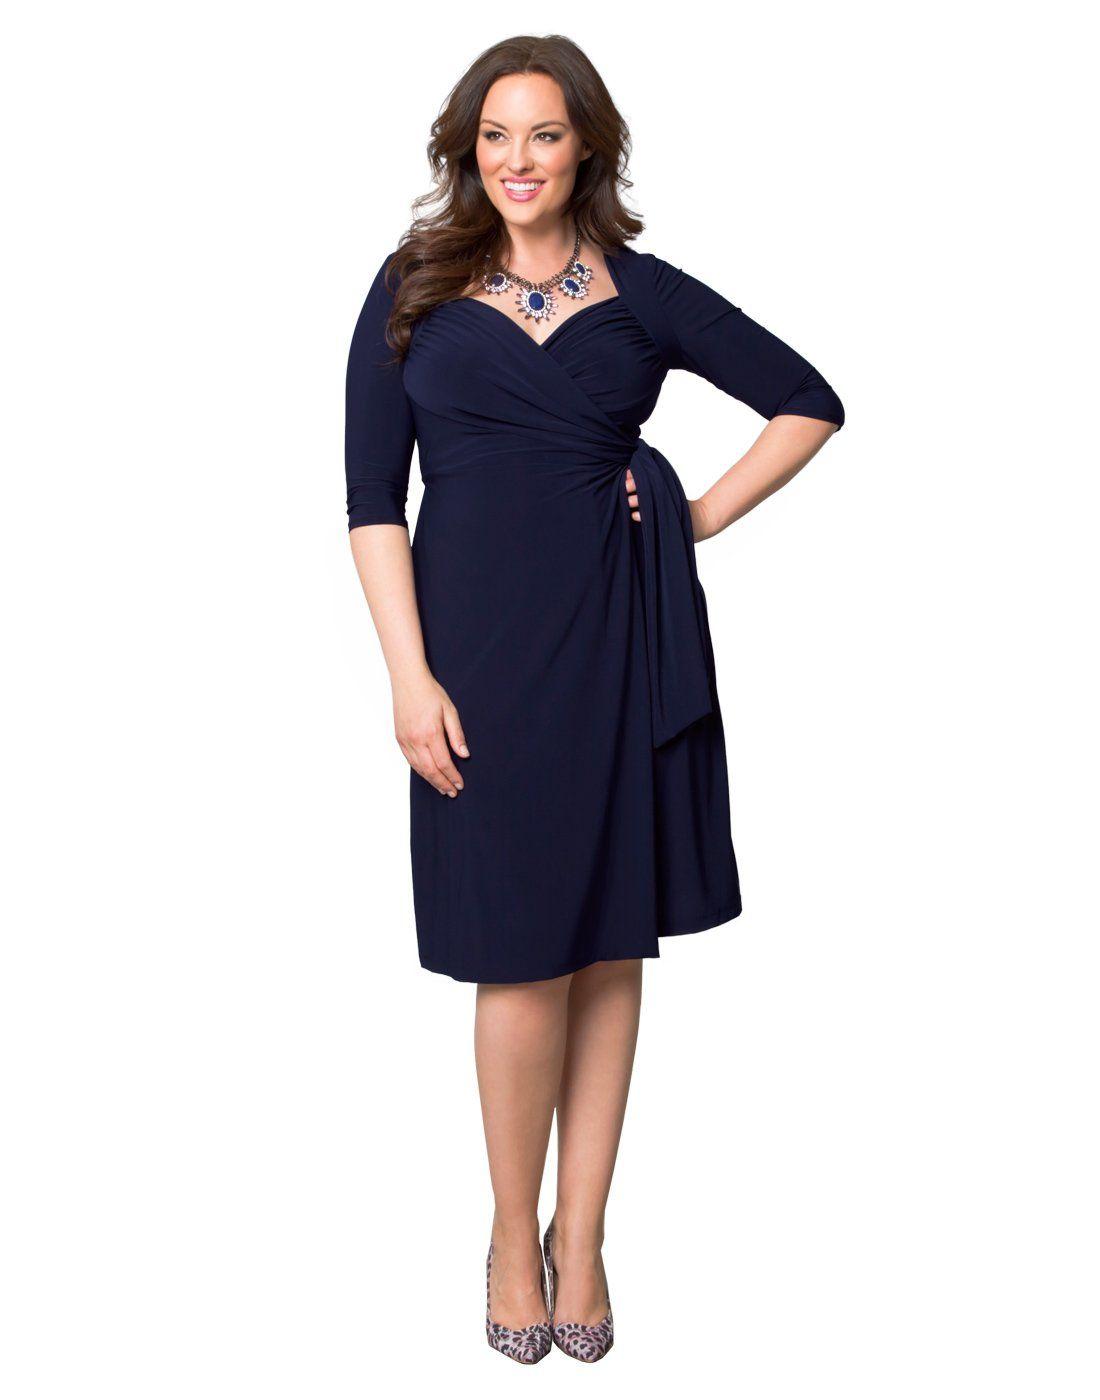 db8a5275a39d Amazon.com  Kiyonna Women s Plus Size Sweetheart Knit Wrap Dress  Clothing